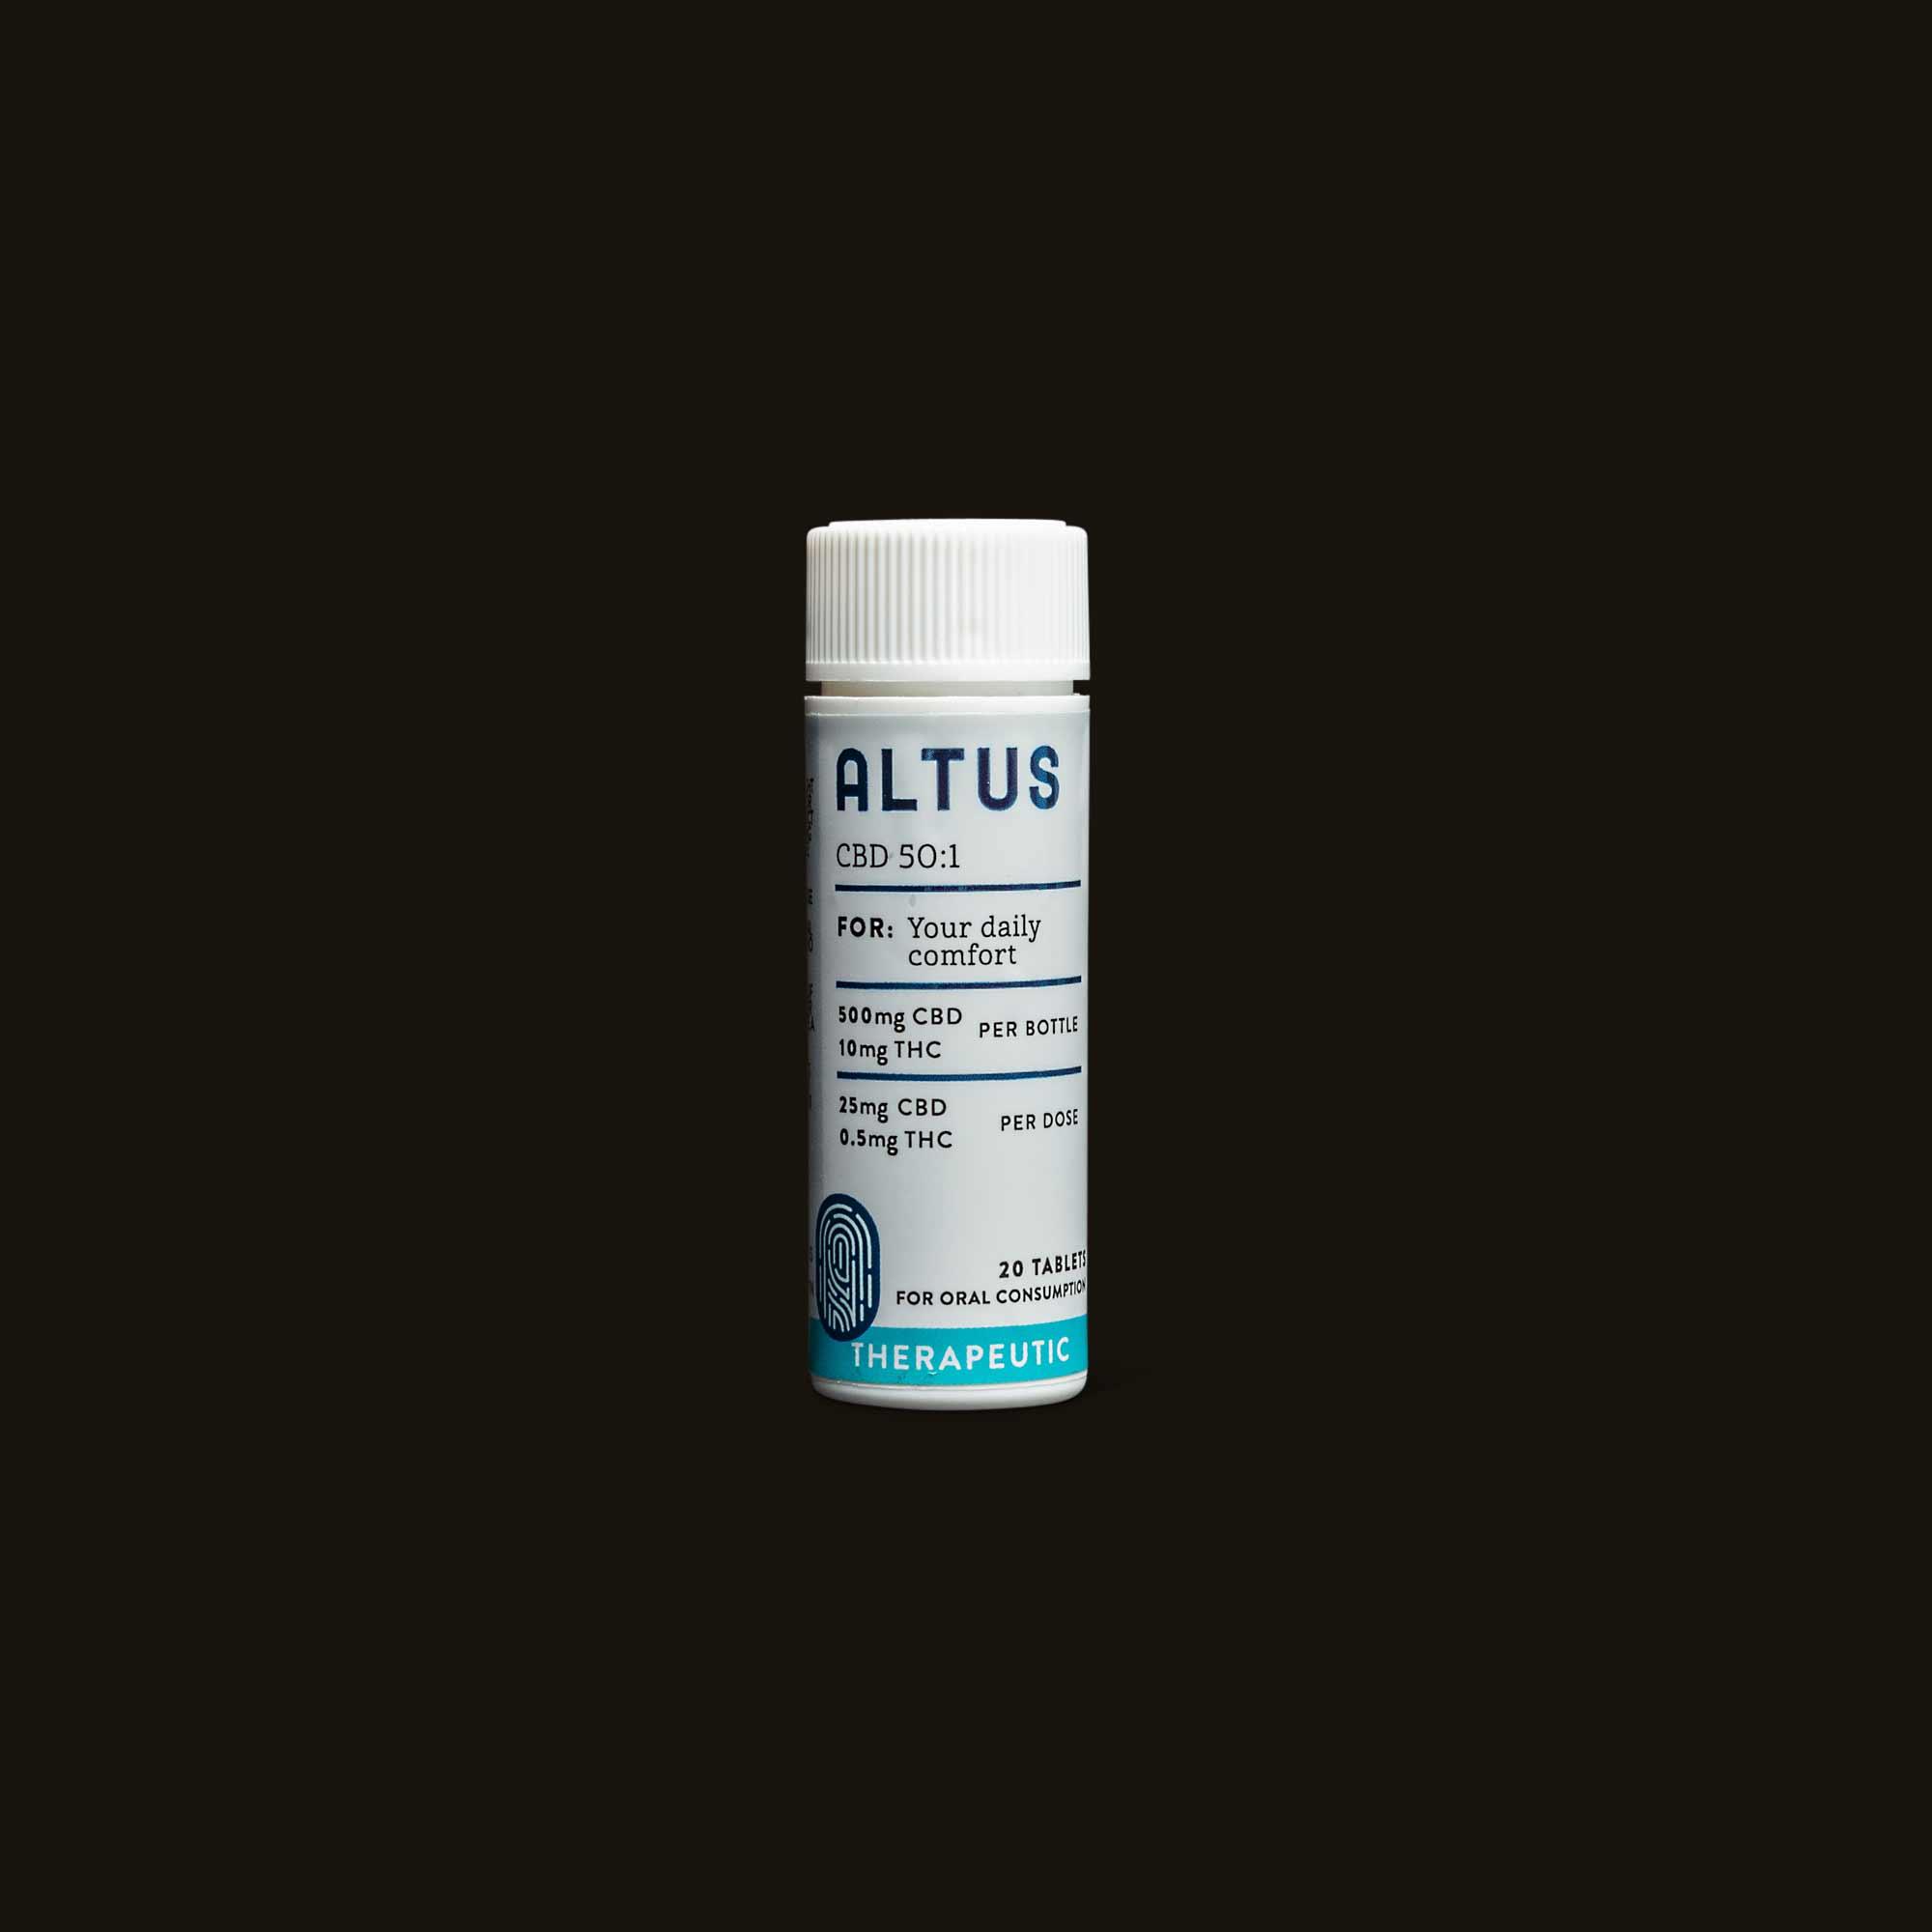 Altus Made Therapeutic 50:1 CBD:THC Tablets